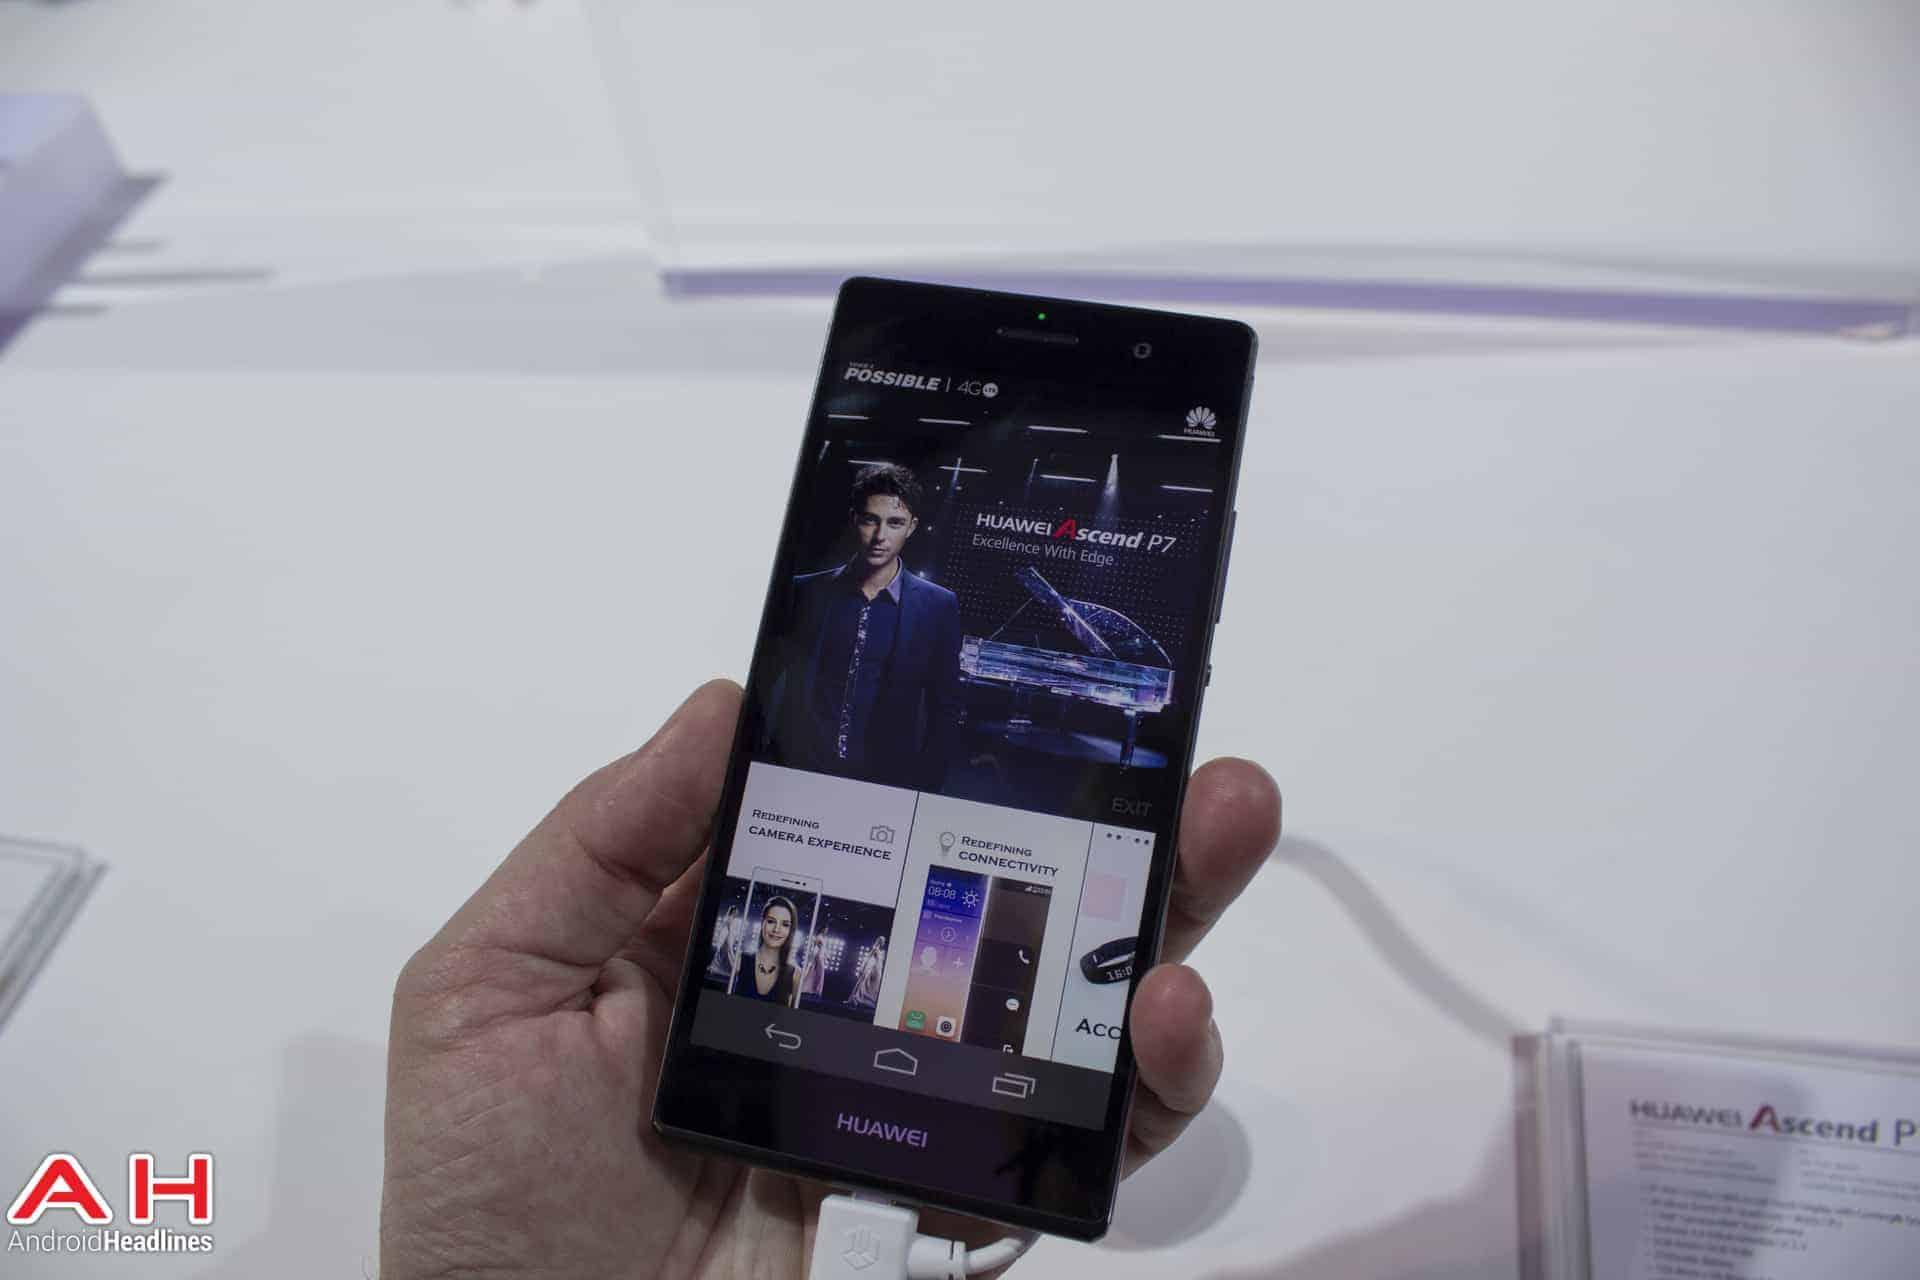 Huawei Ascend P7 AH 7